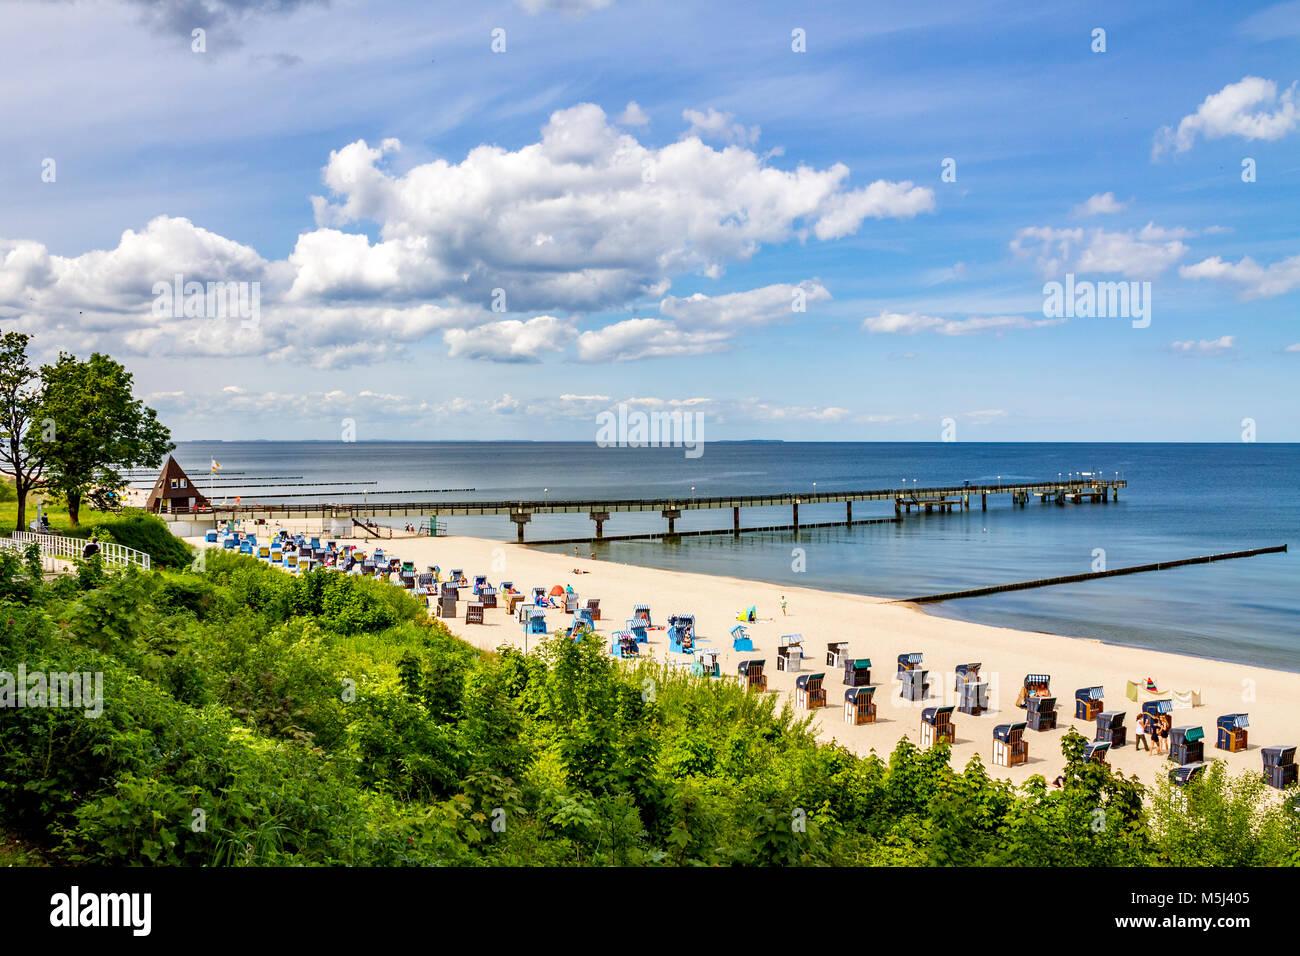 Germany, Mecklenburg-Western Pomerania, Baltic sea seaside resort Koserow - Stock Image